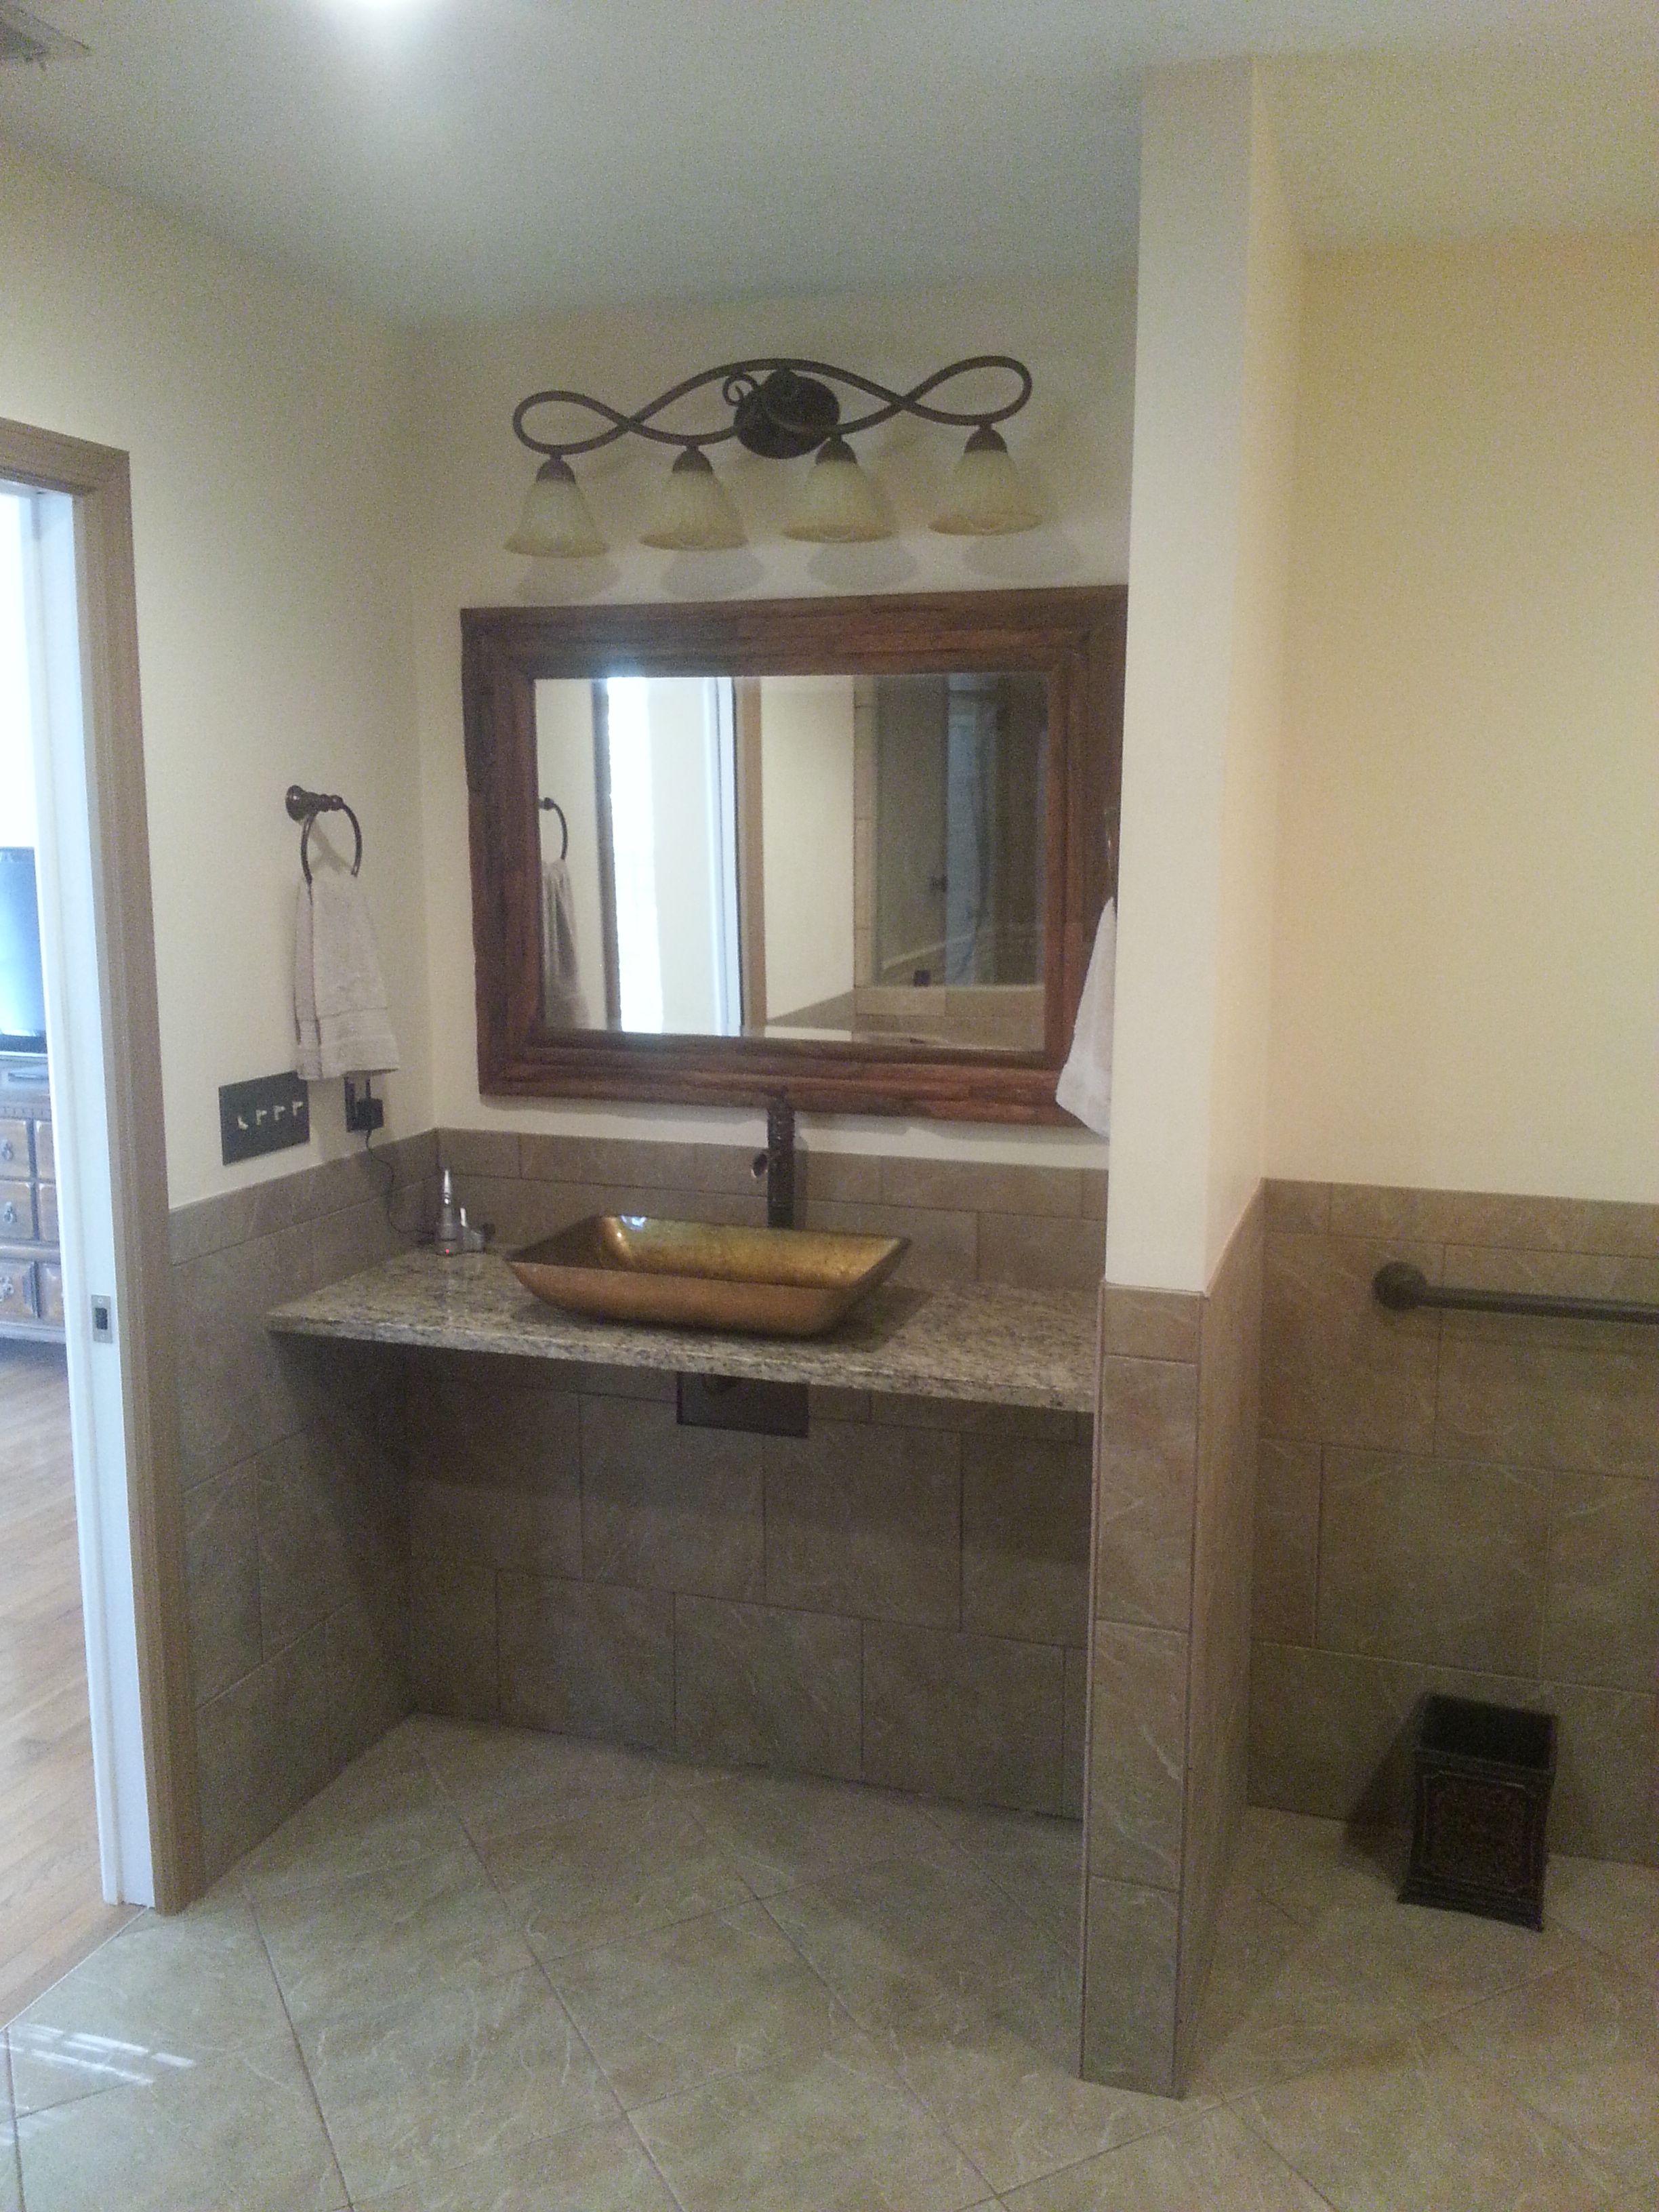 Wheelchair Accessible Sink In Master Bath Faucet Cutoffs